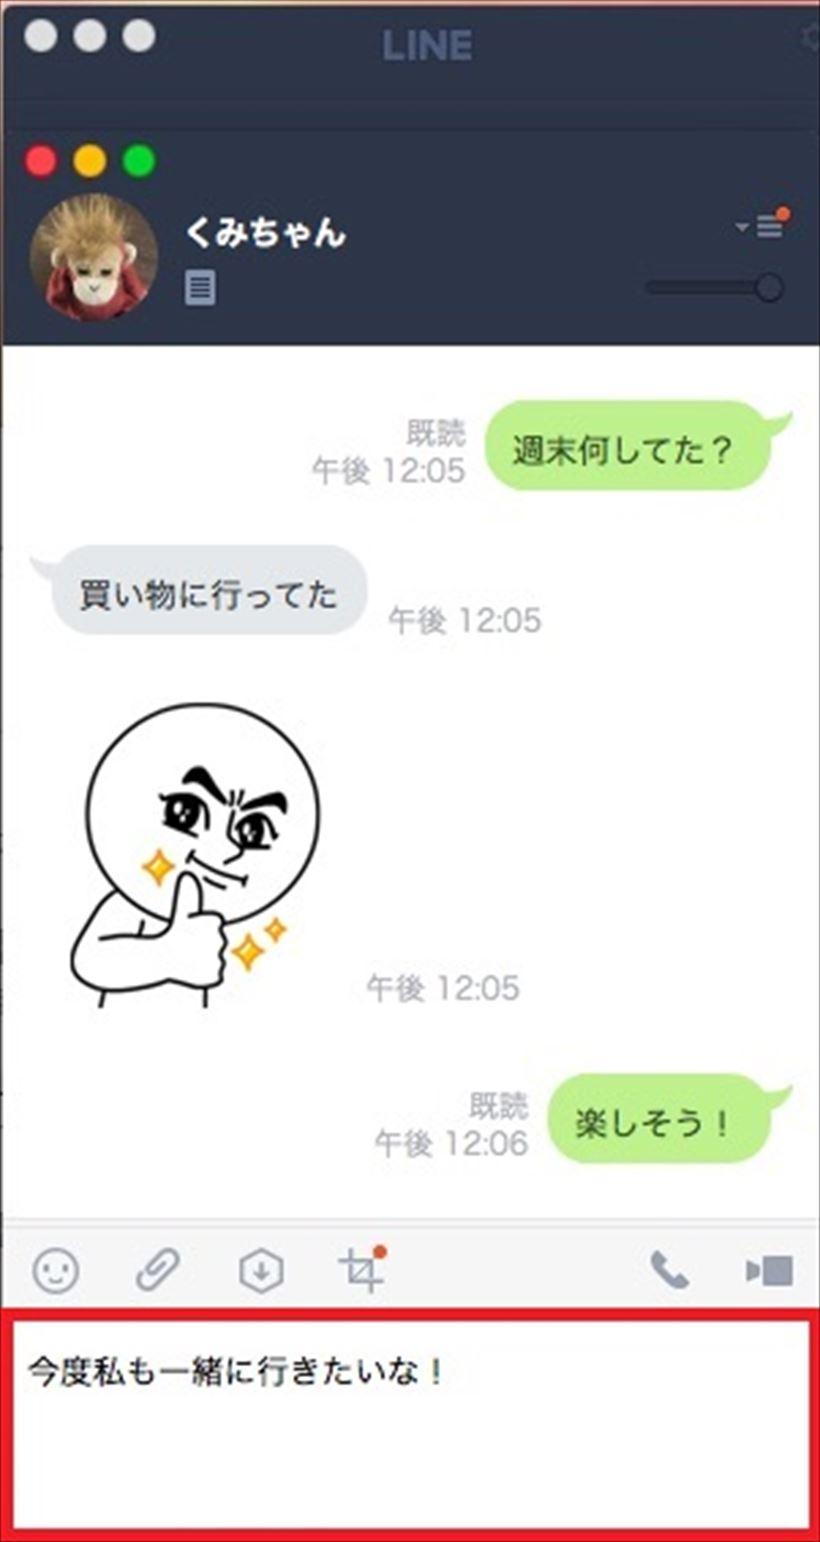 20161125_y-koba_LINE_010_R